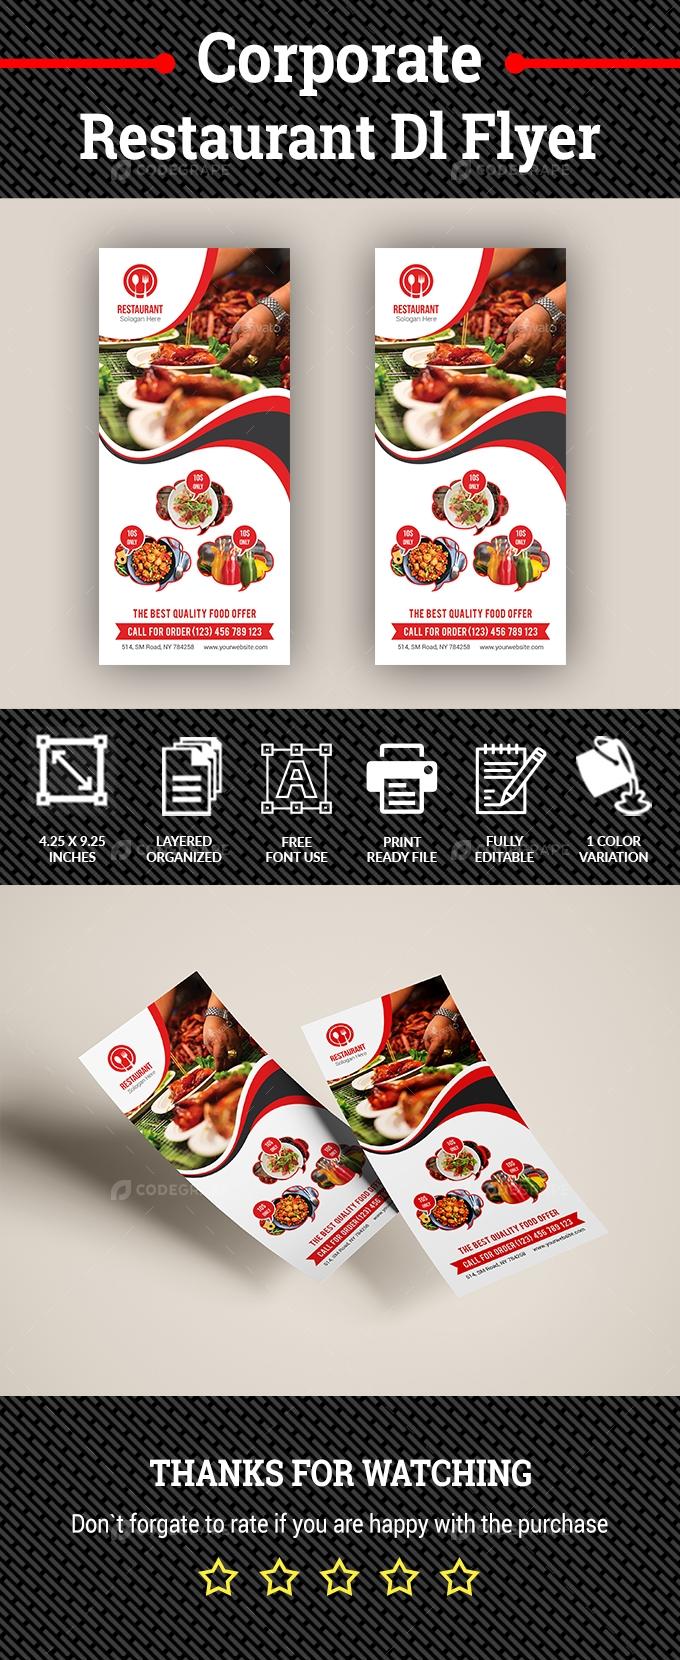 Corporate Restaurant Dl Flyer